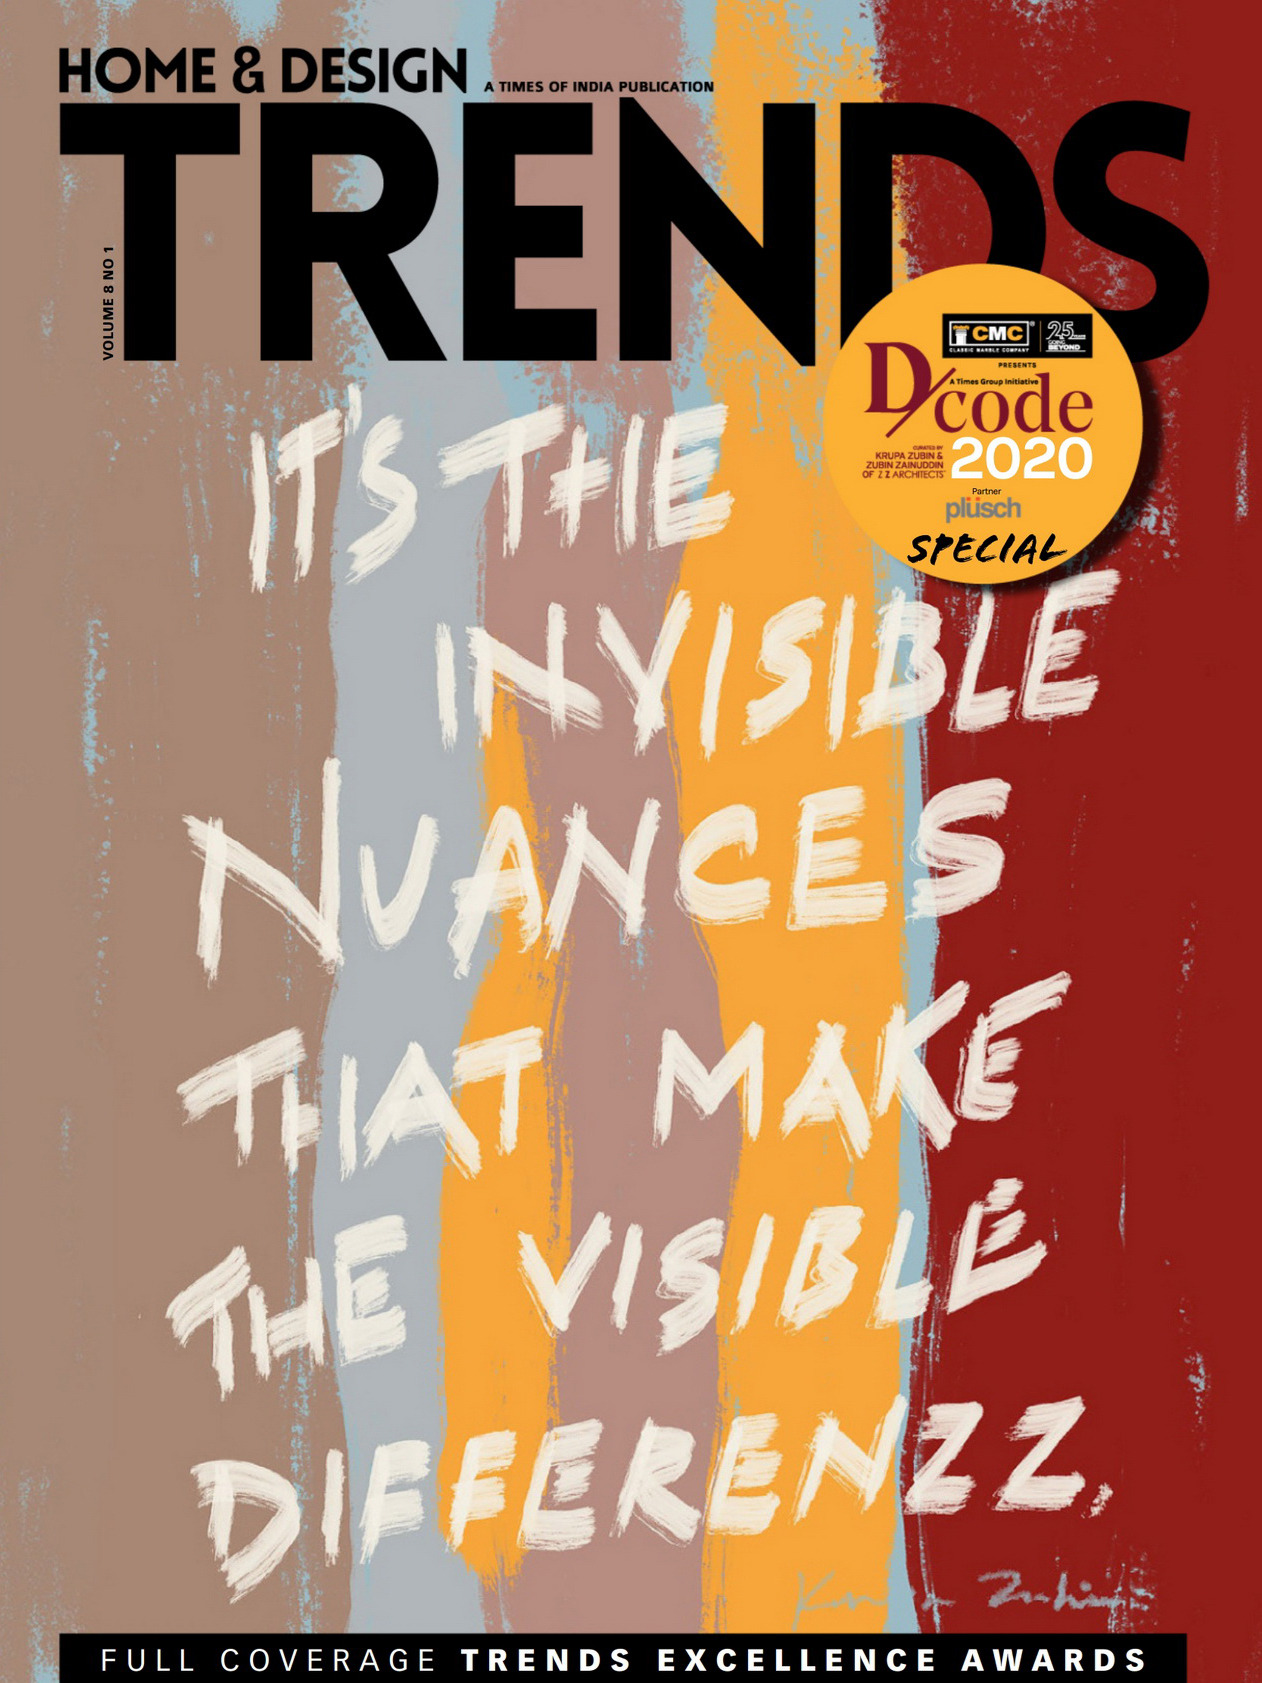 《Home & Design Trends》英国版室内设计杂志2020年06月号